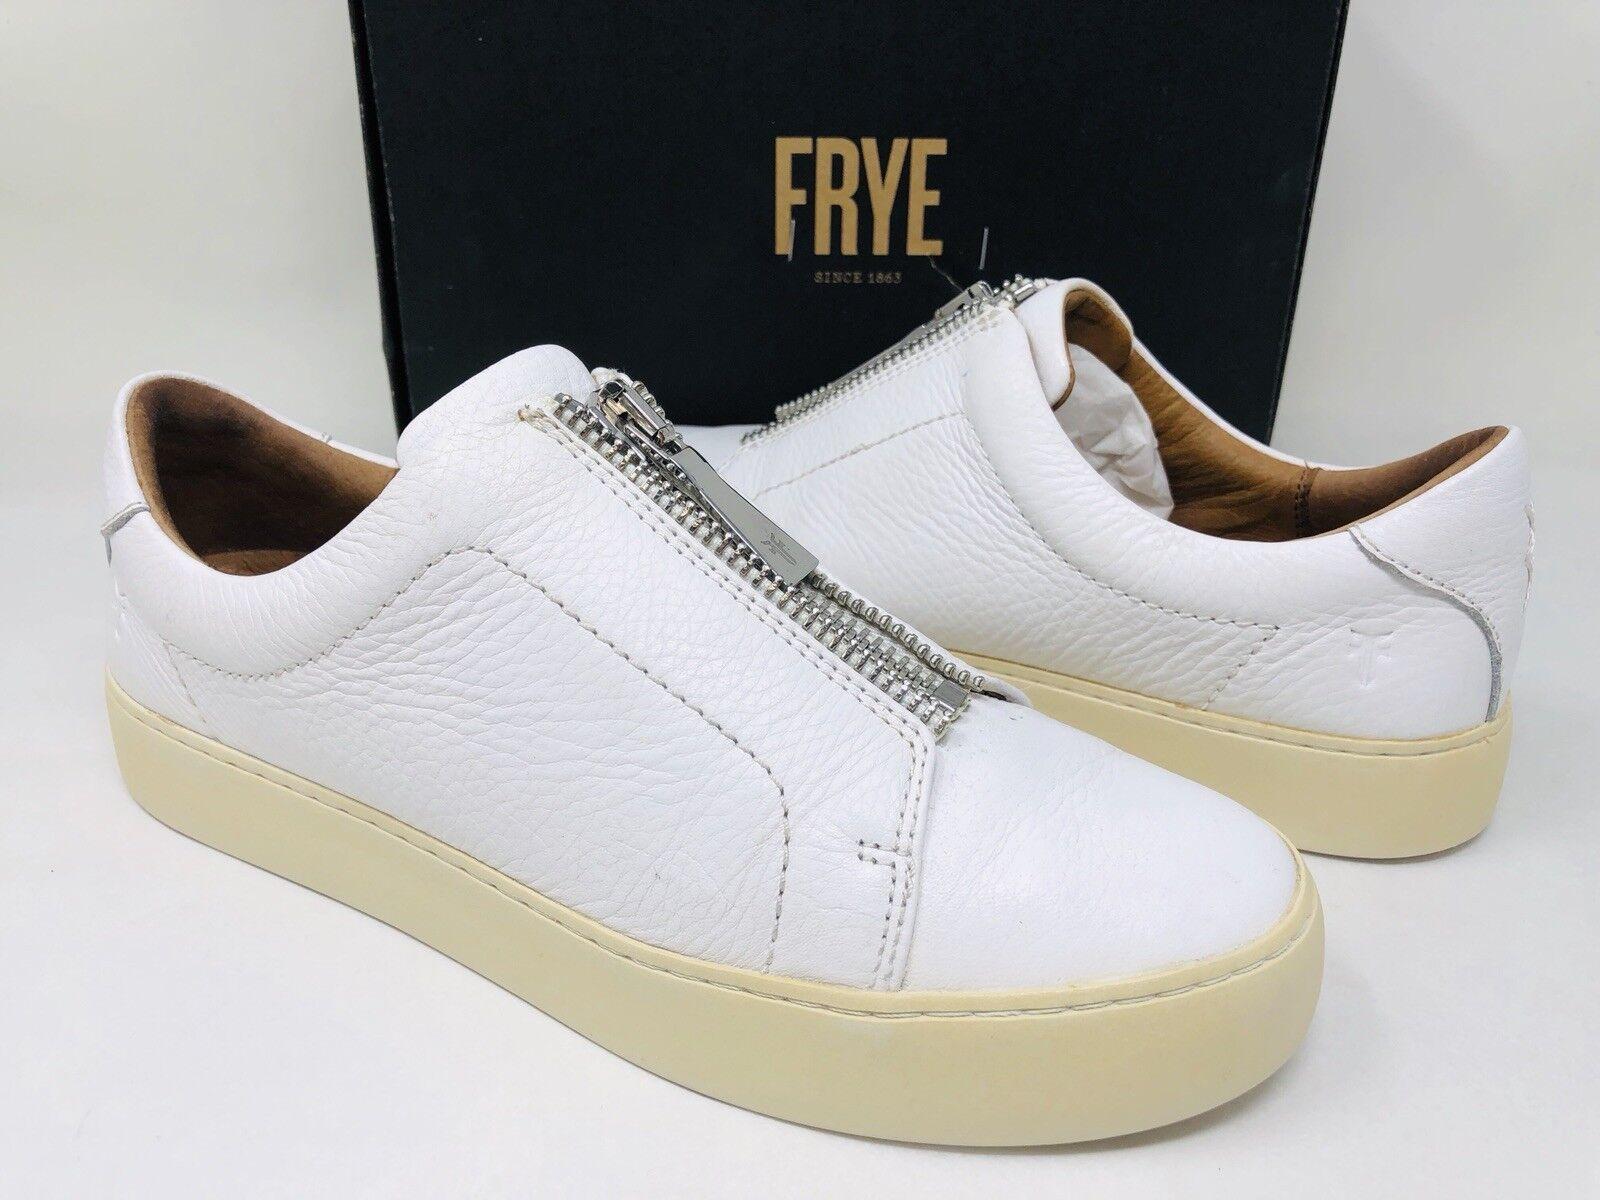 Frye Women's Lena Leather Platform